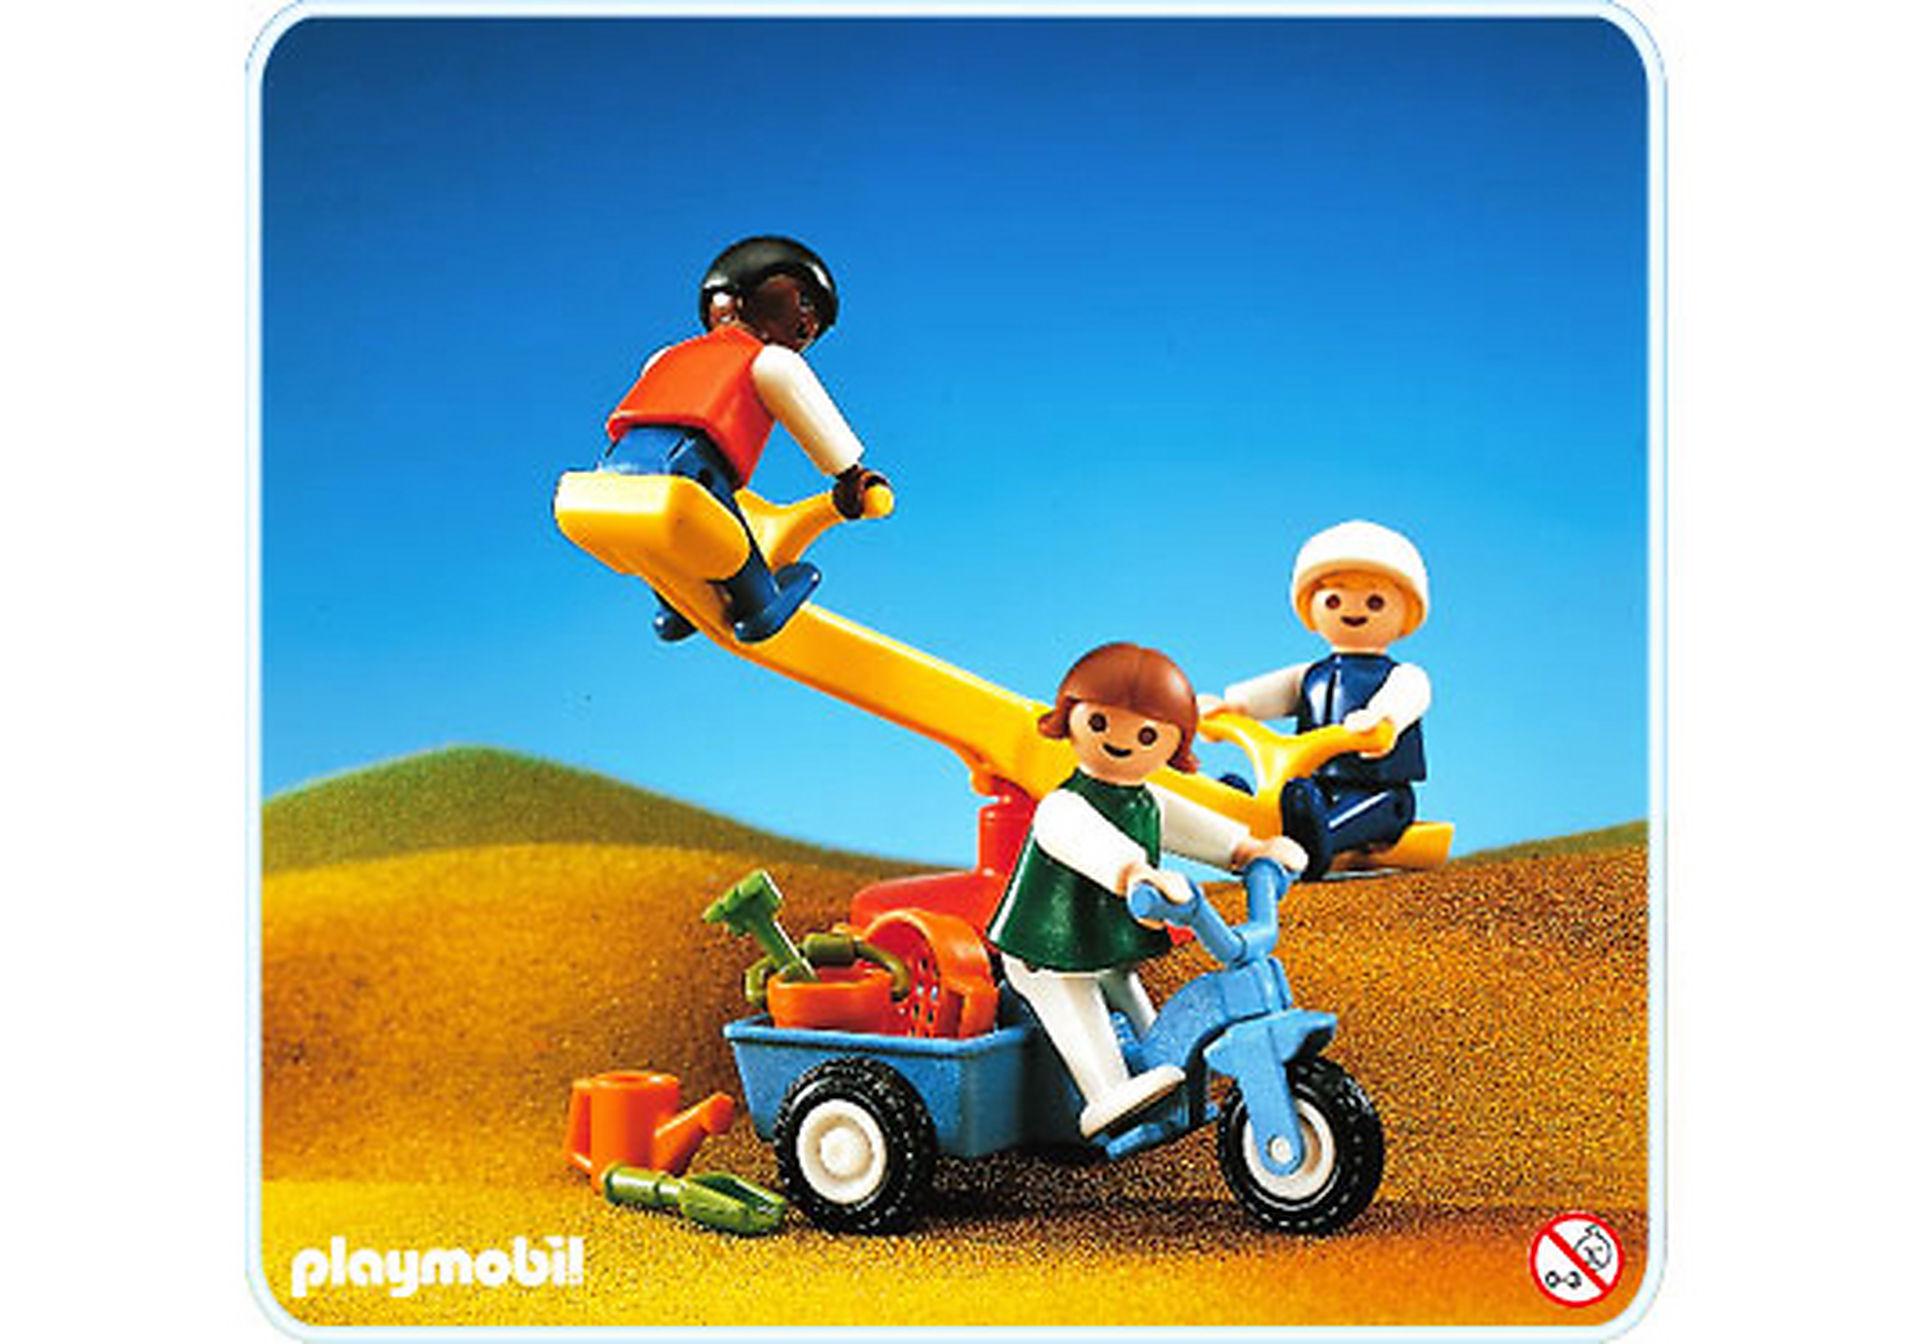 3308-A Kinder/Wippe/Dreirad zoom image1